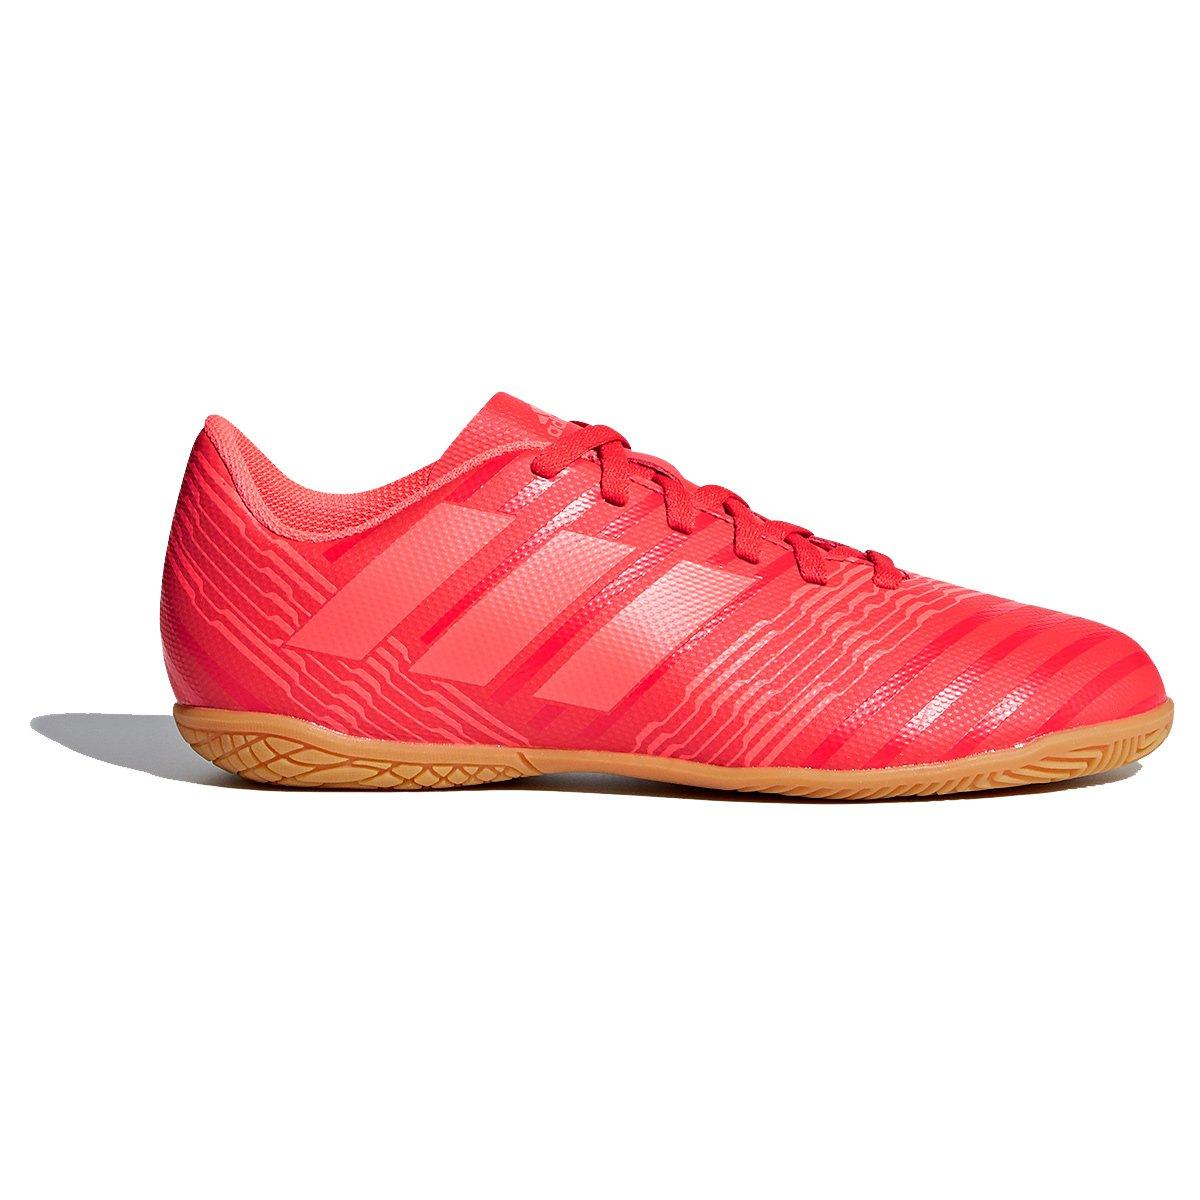 82cf275ae3 Chuteira Futsal Infantil Adidas Nemeziz 17.4 IN